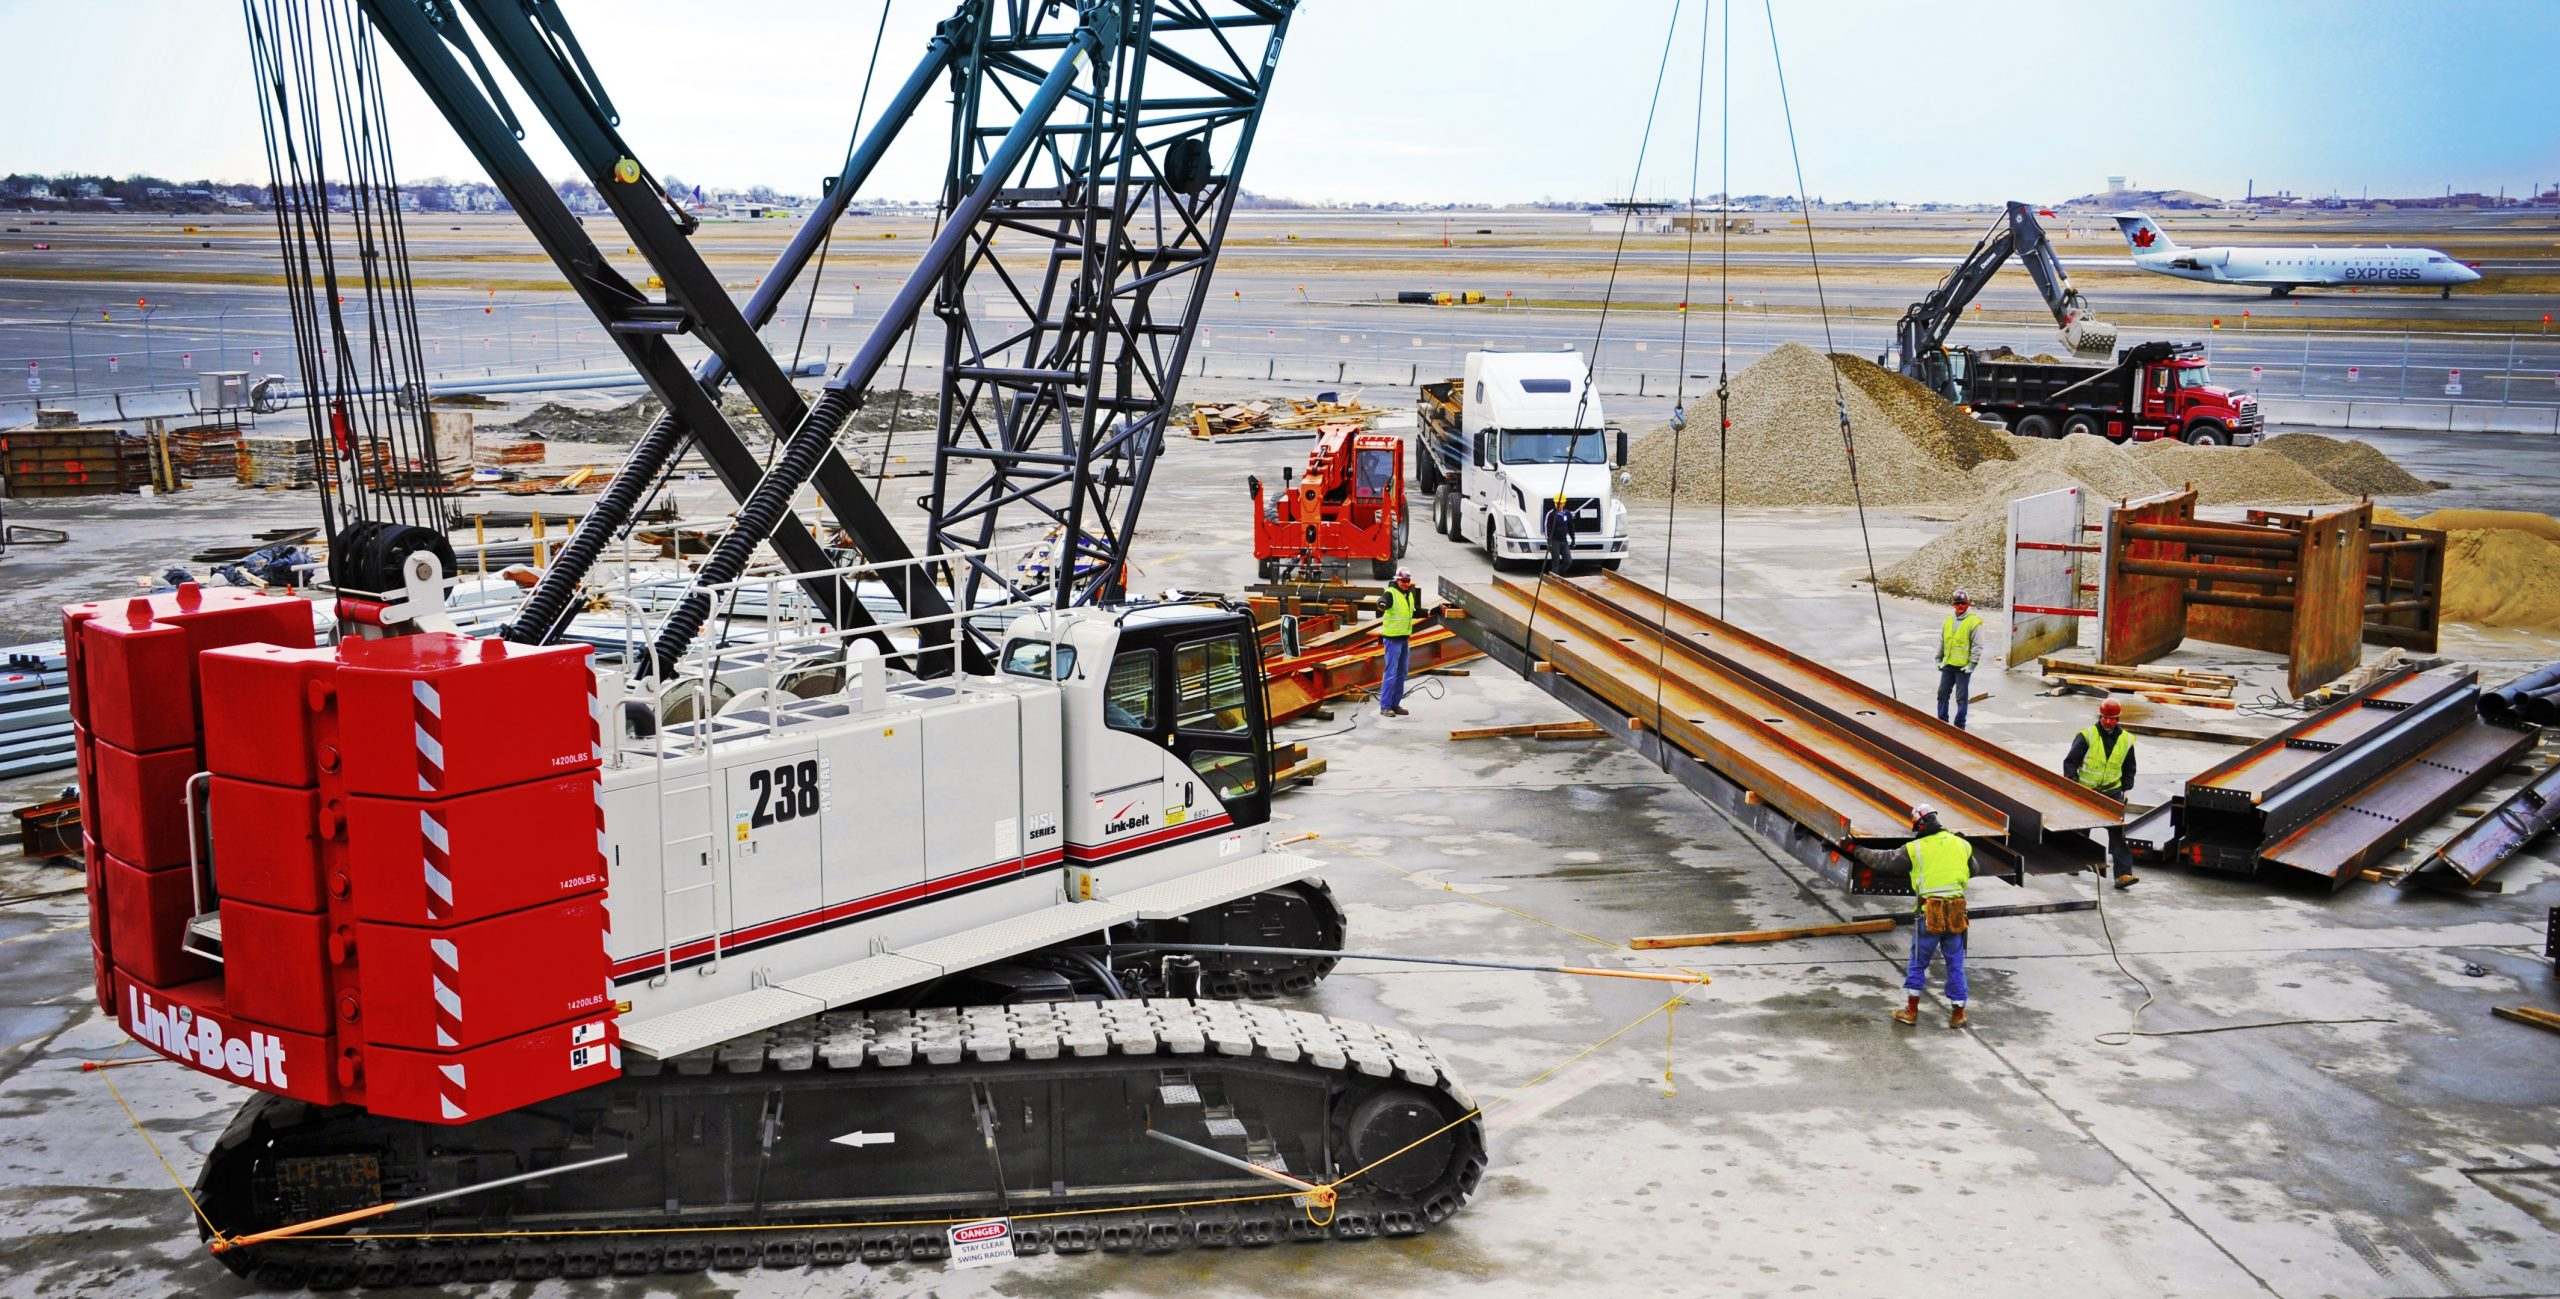 crawler-cranes-lattice-boom-238-hsl-link-belt-scaled